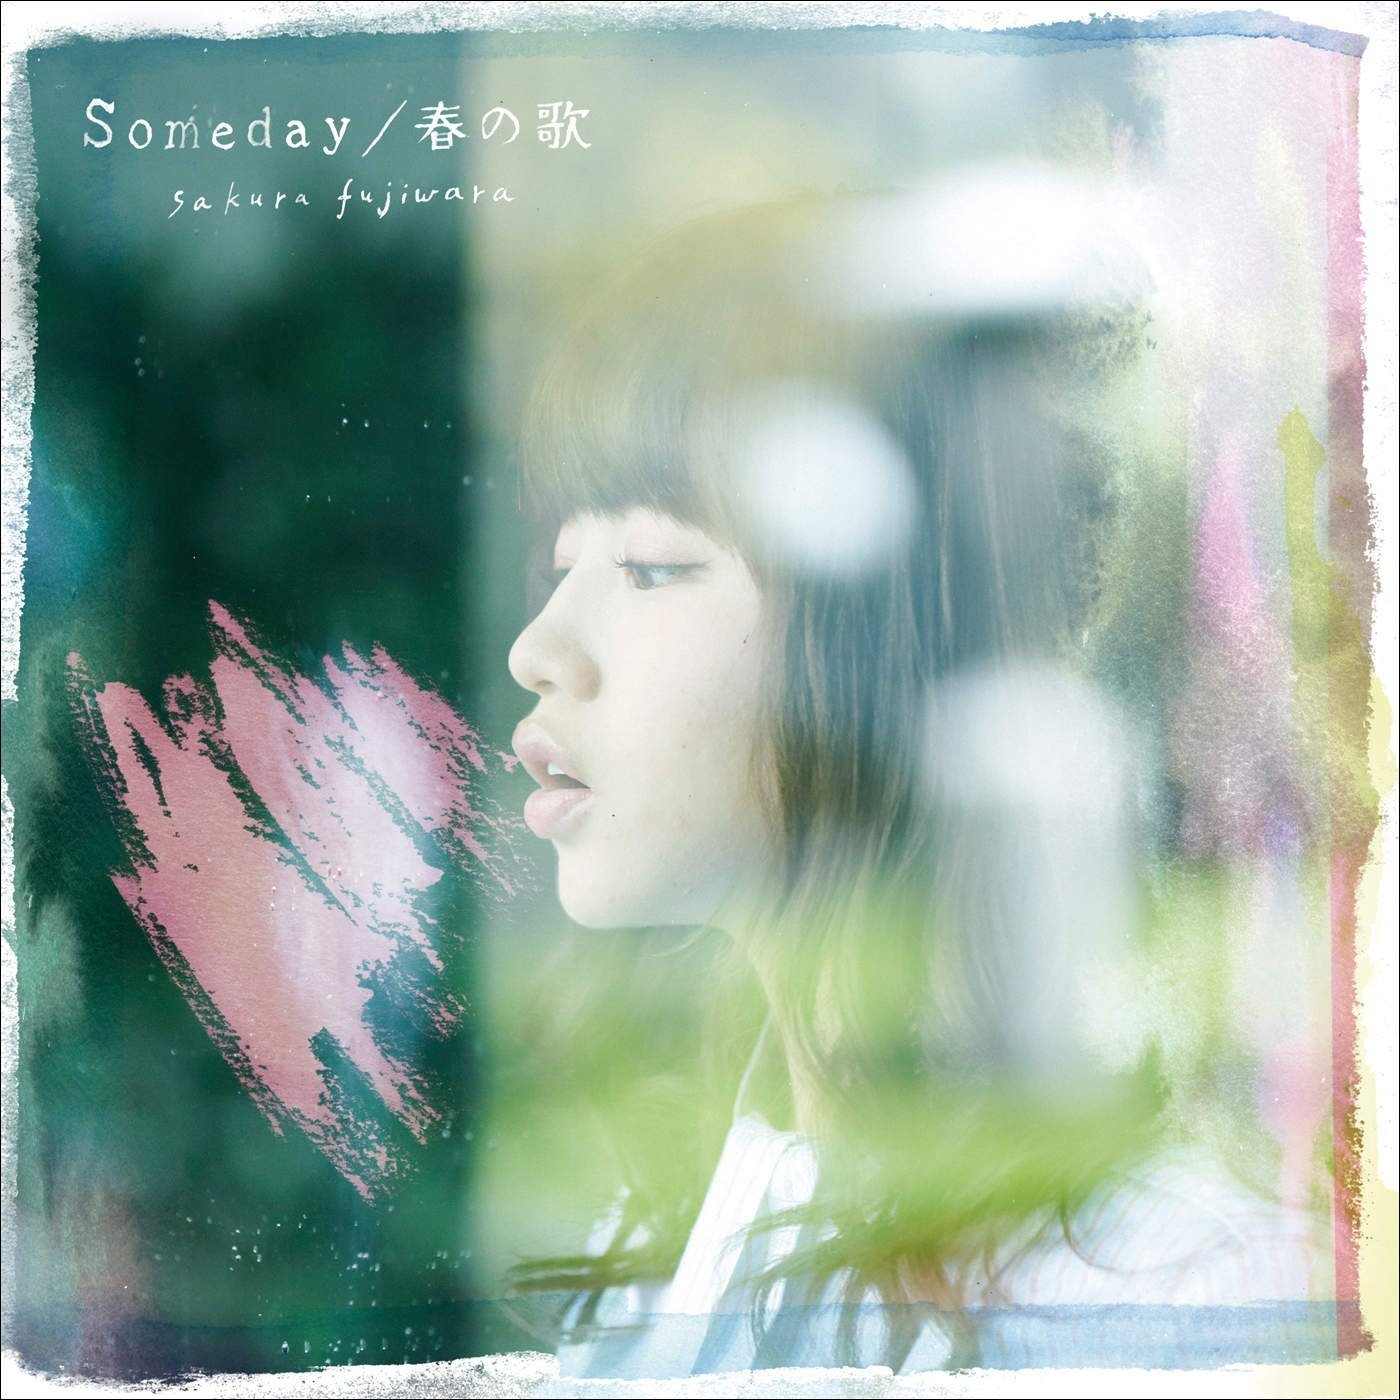 [Single] 藤原さくら (Sakura Fujiwara) – Someday / 春の歌 [FLAC / 24bit Lossless / WEB] [2017.03.29]